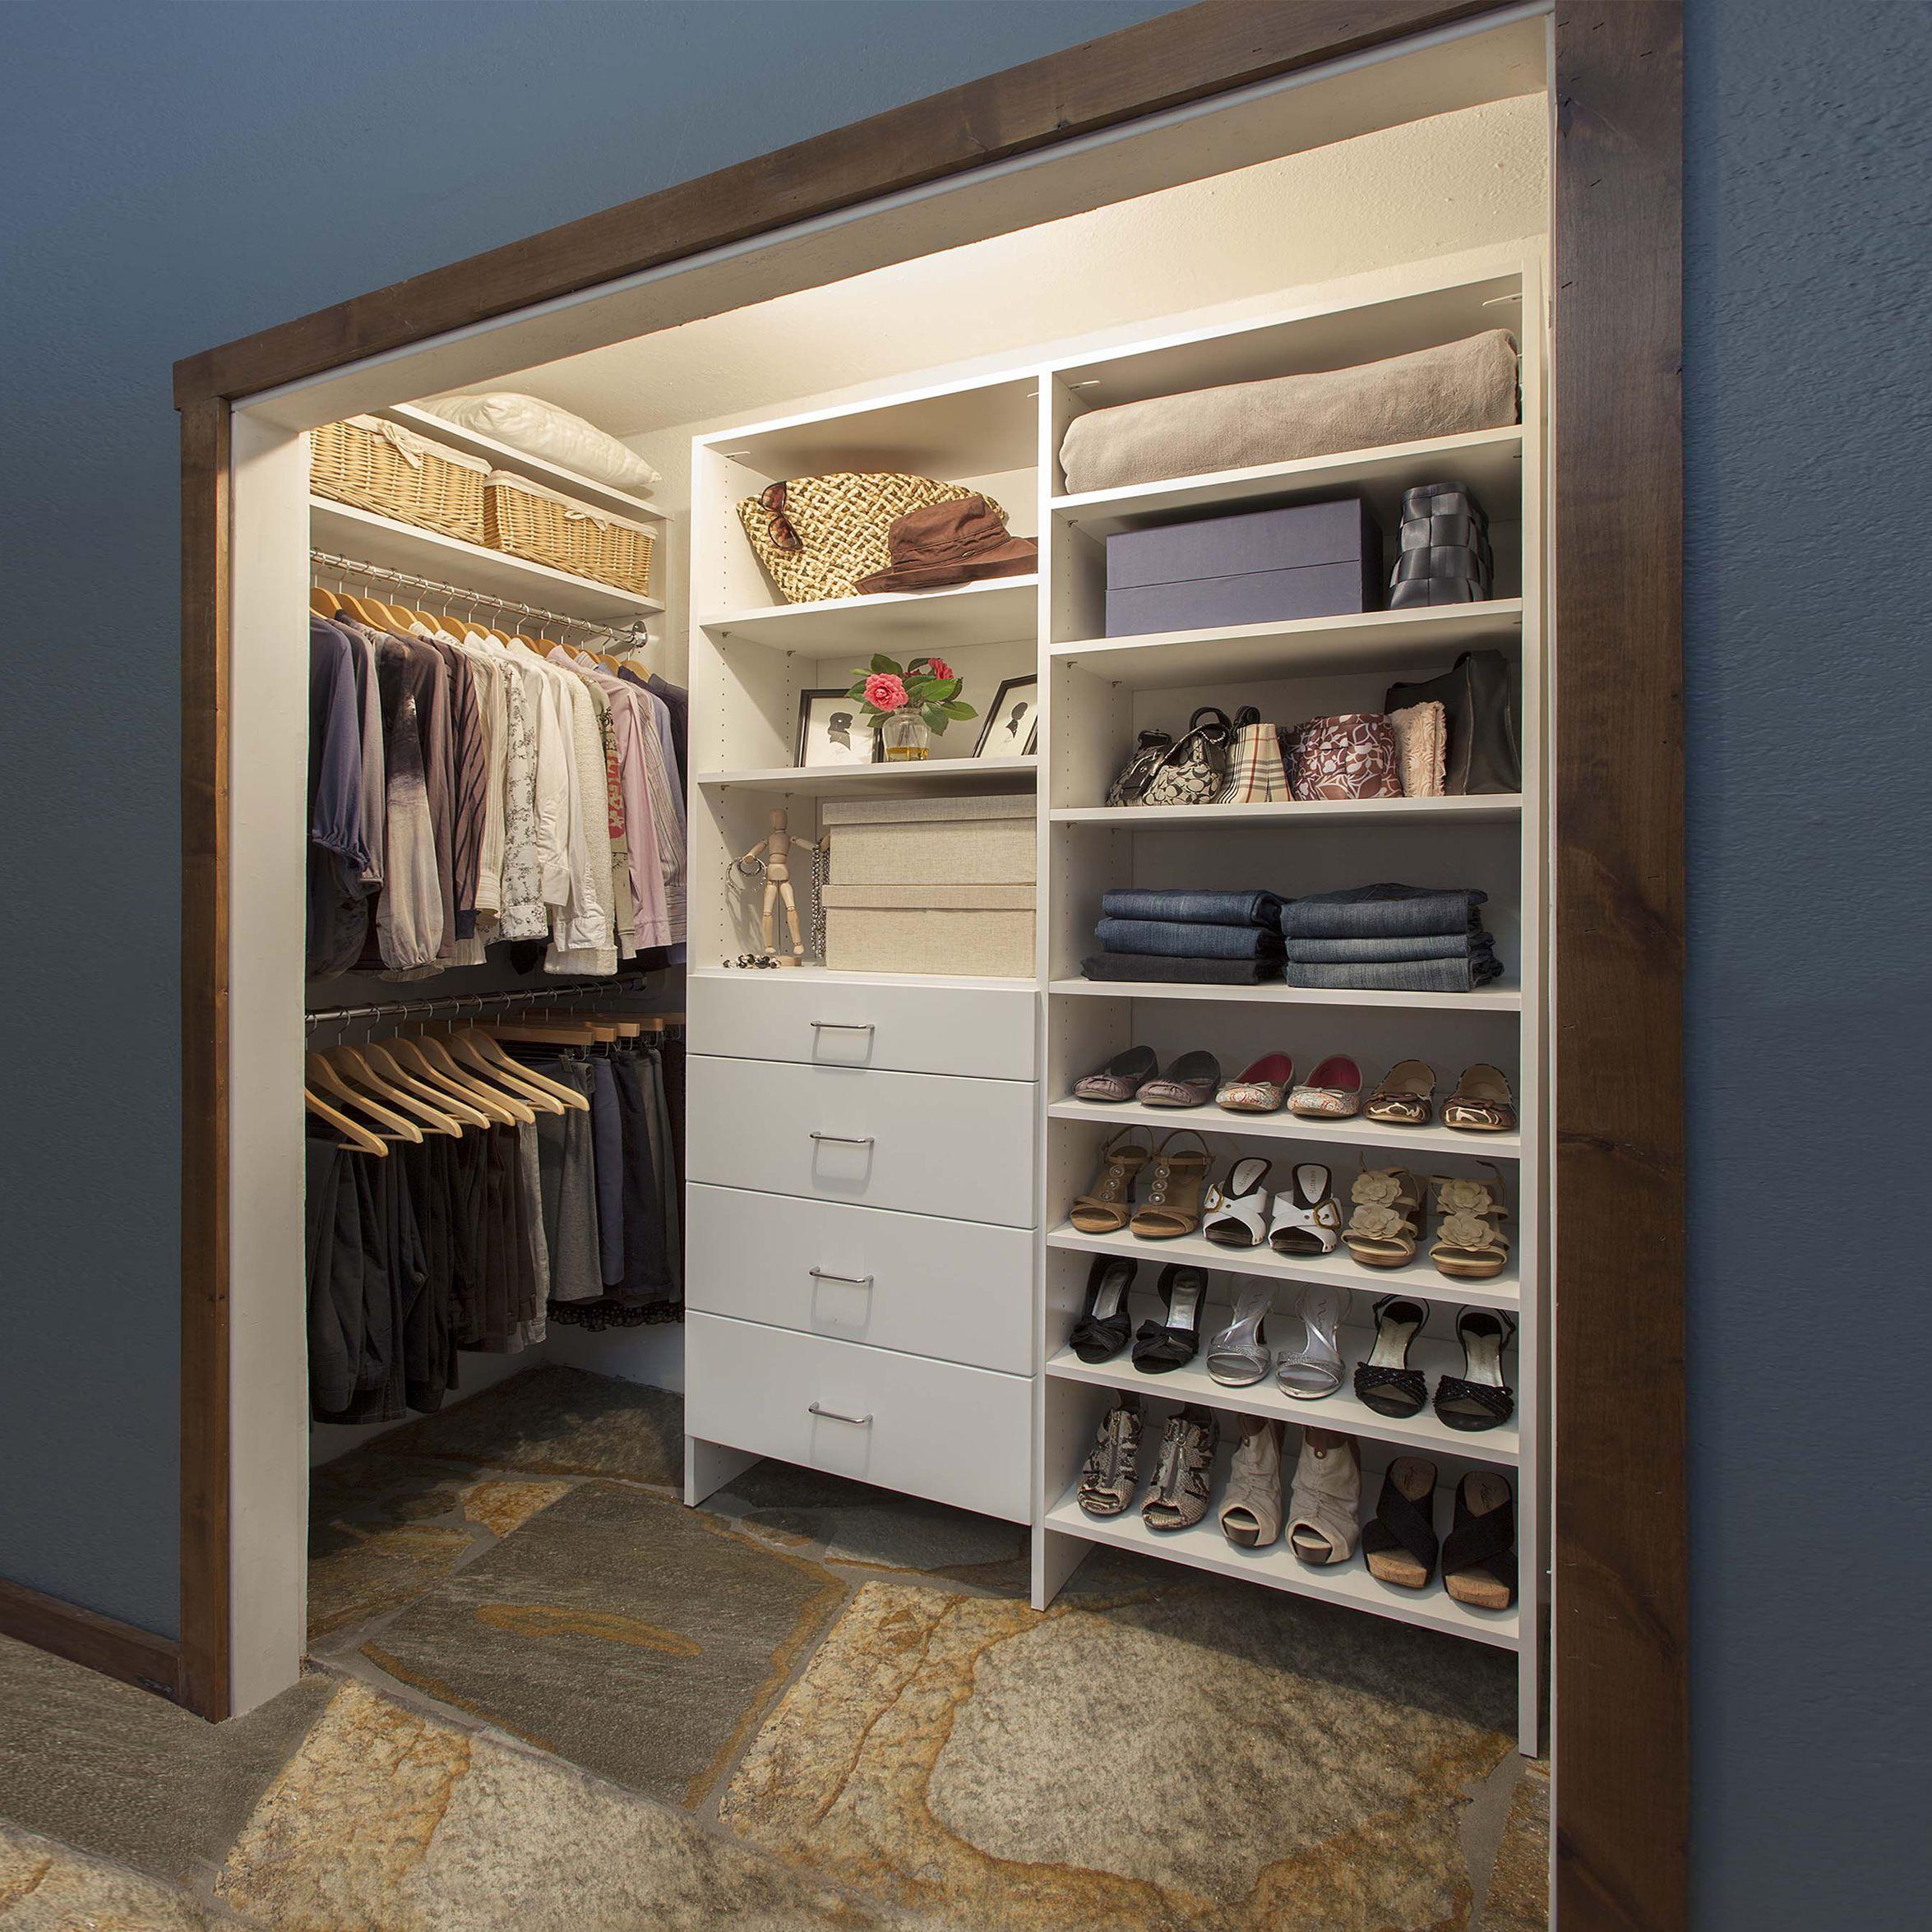 Reach In Closet Solutions From Nova Closet Call Us Novacloset